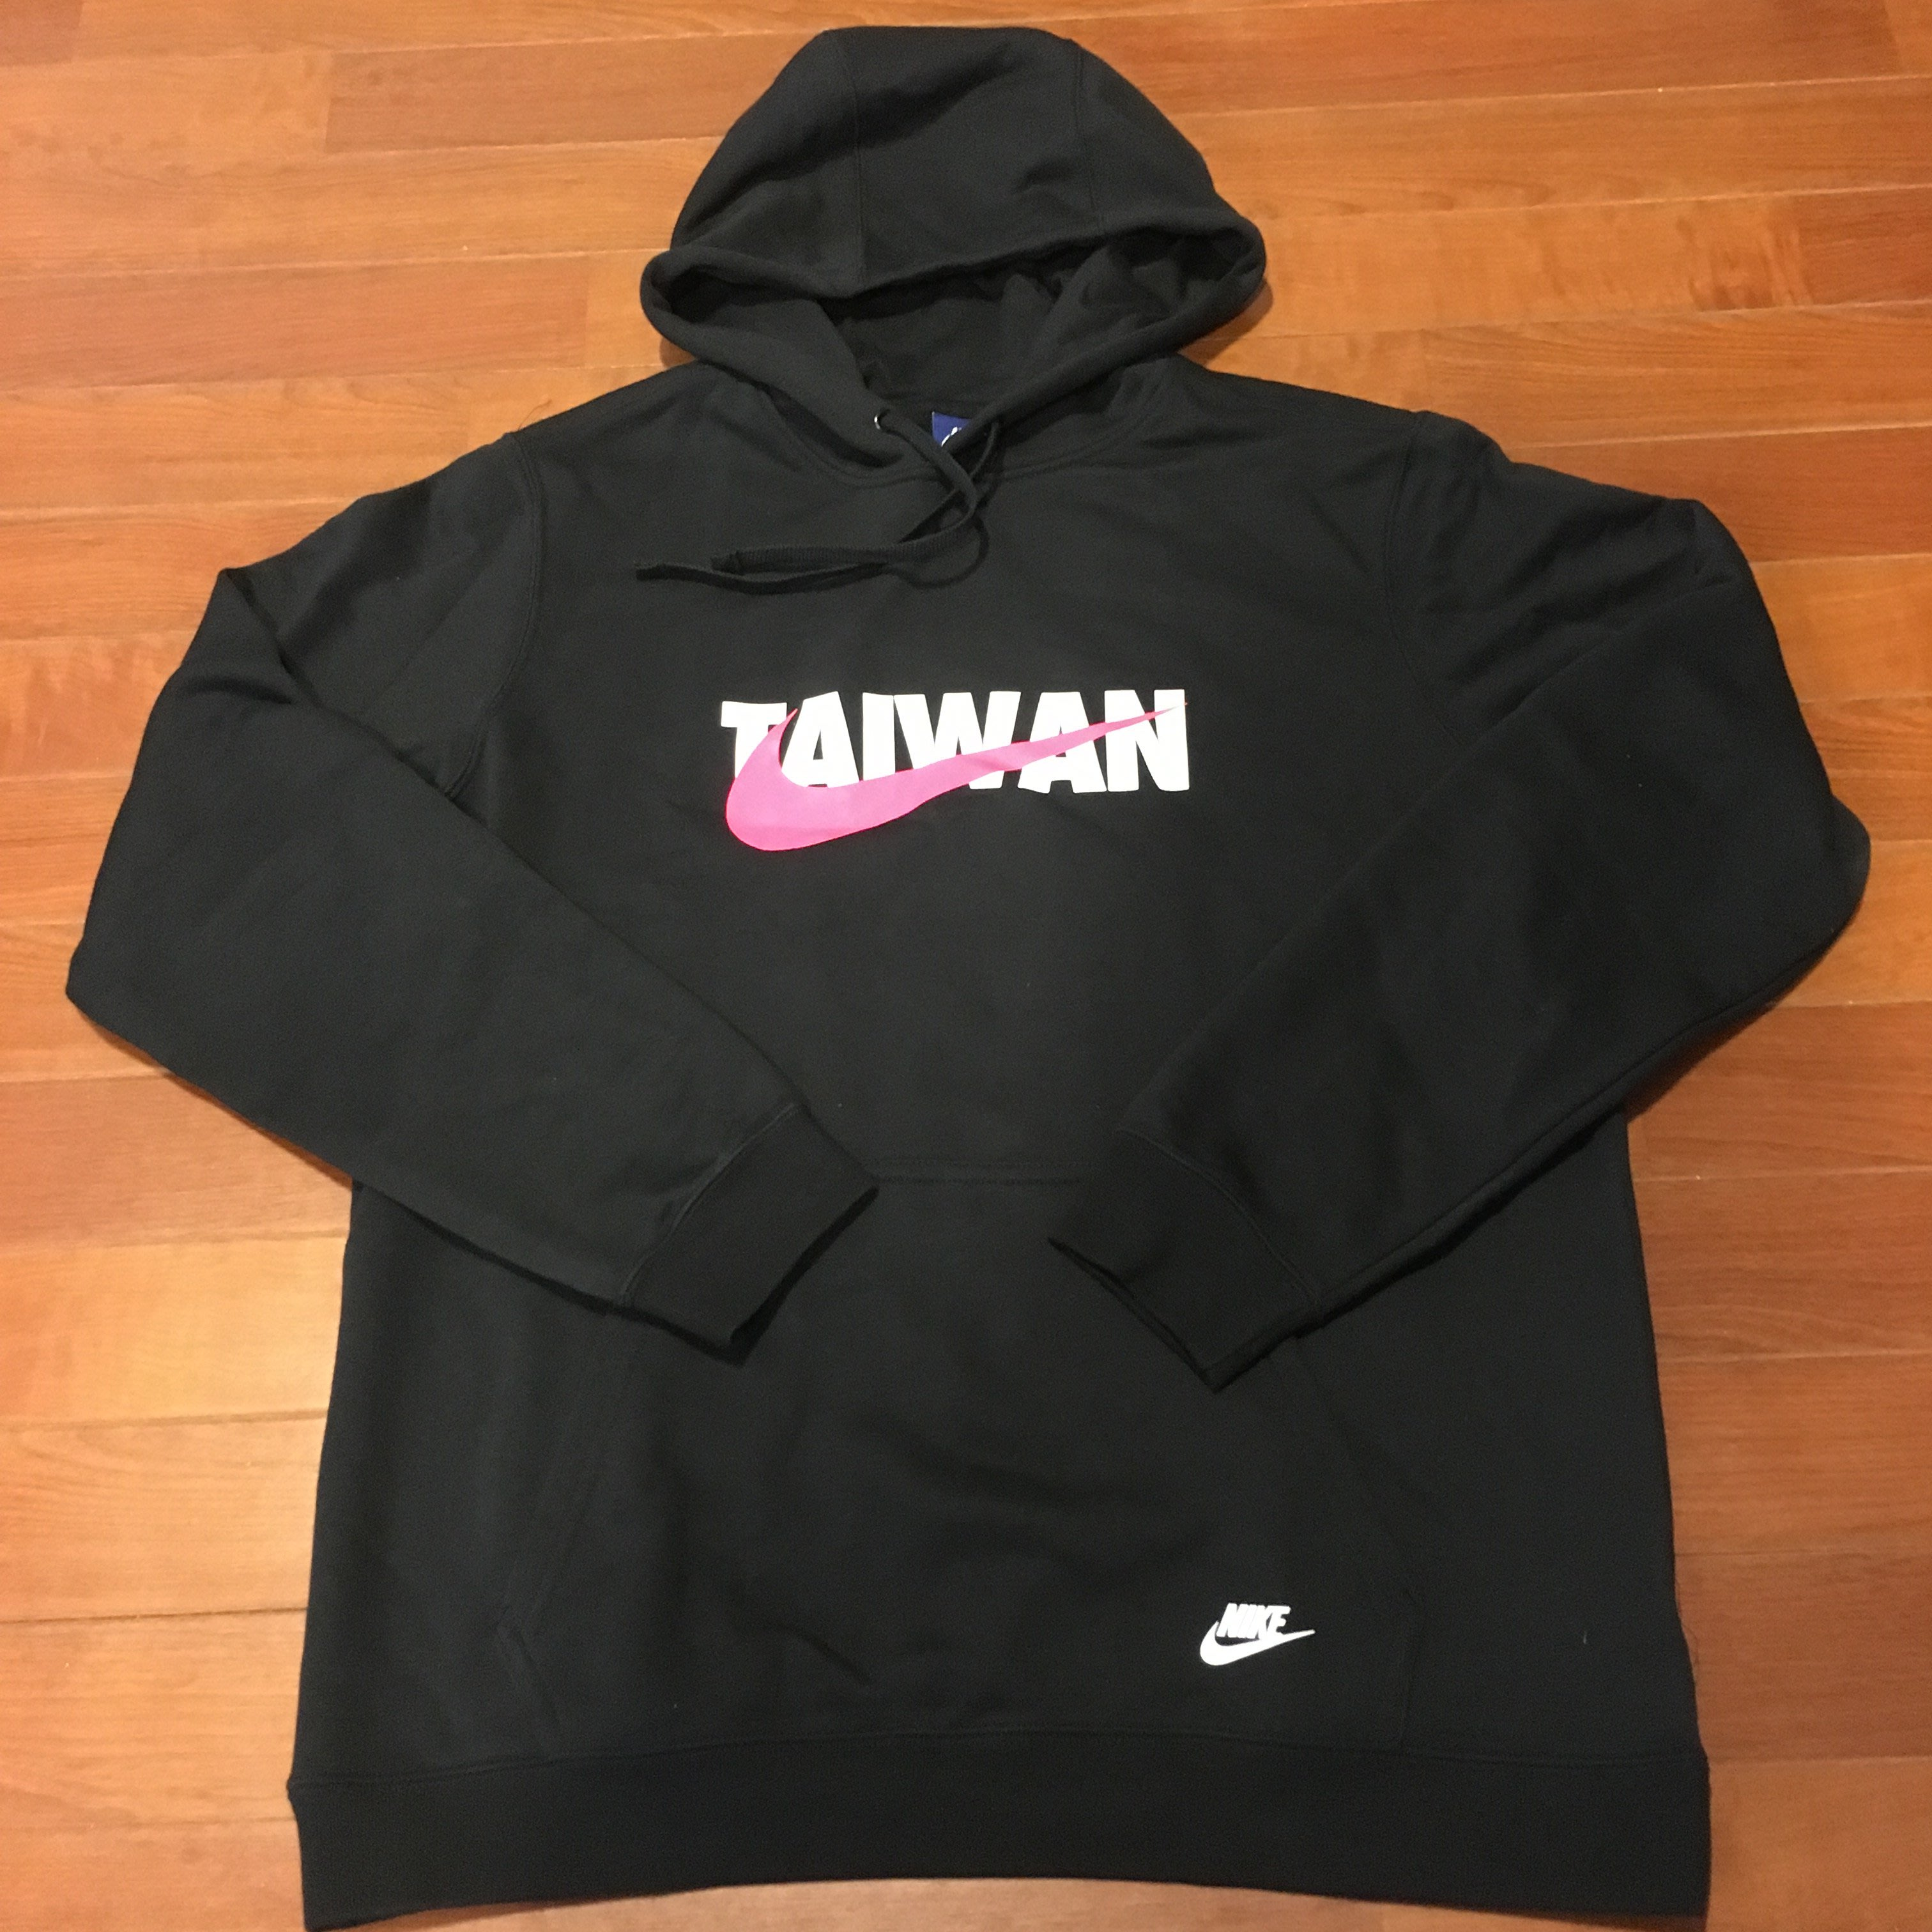 Nike Taiwan Hoodie 男運動休閒連帽T恤 外套帽T 台灣 黑白桃紅 中華隊 舒適純棉 薄款 限量 XL